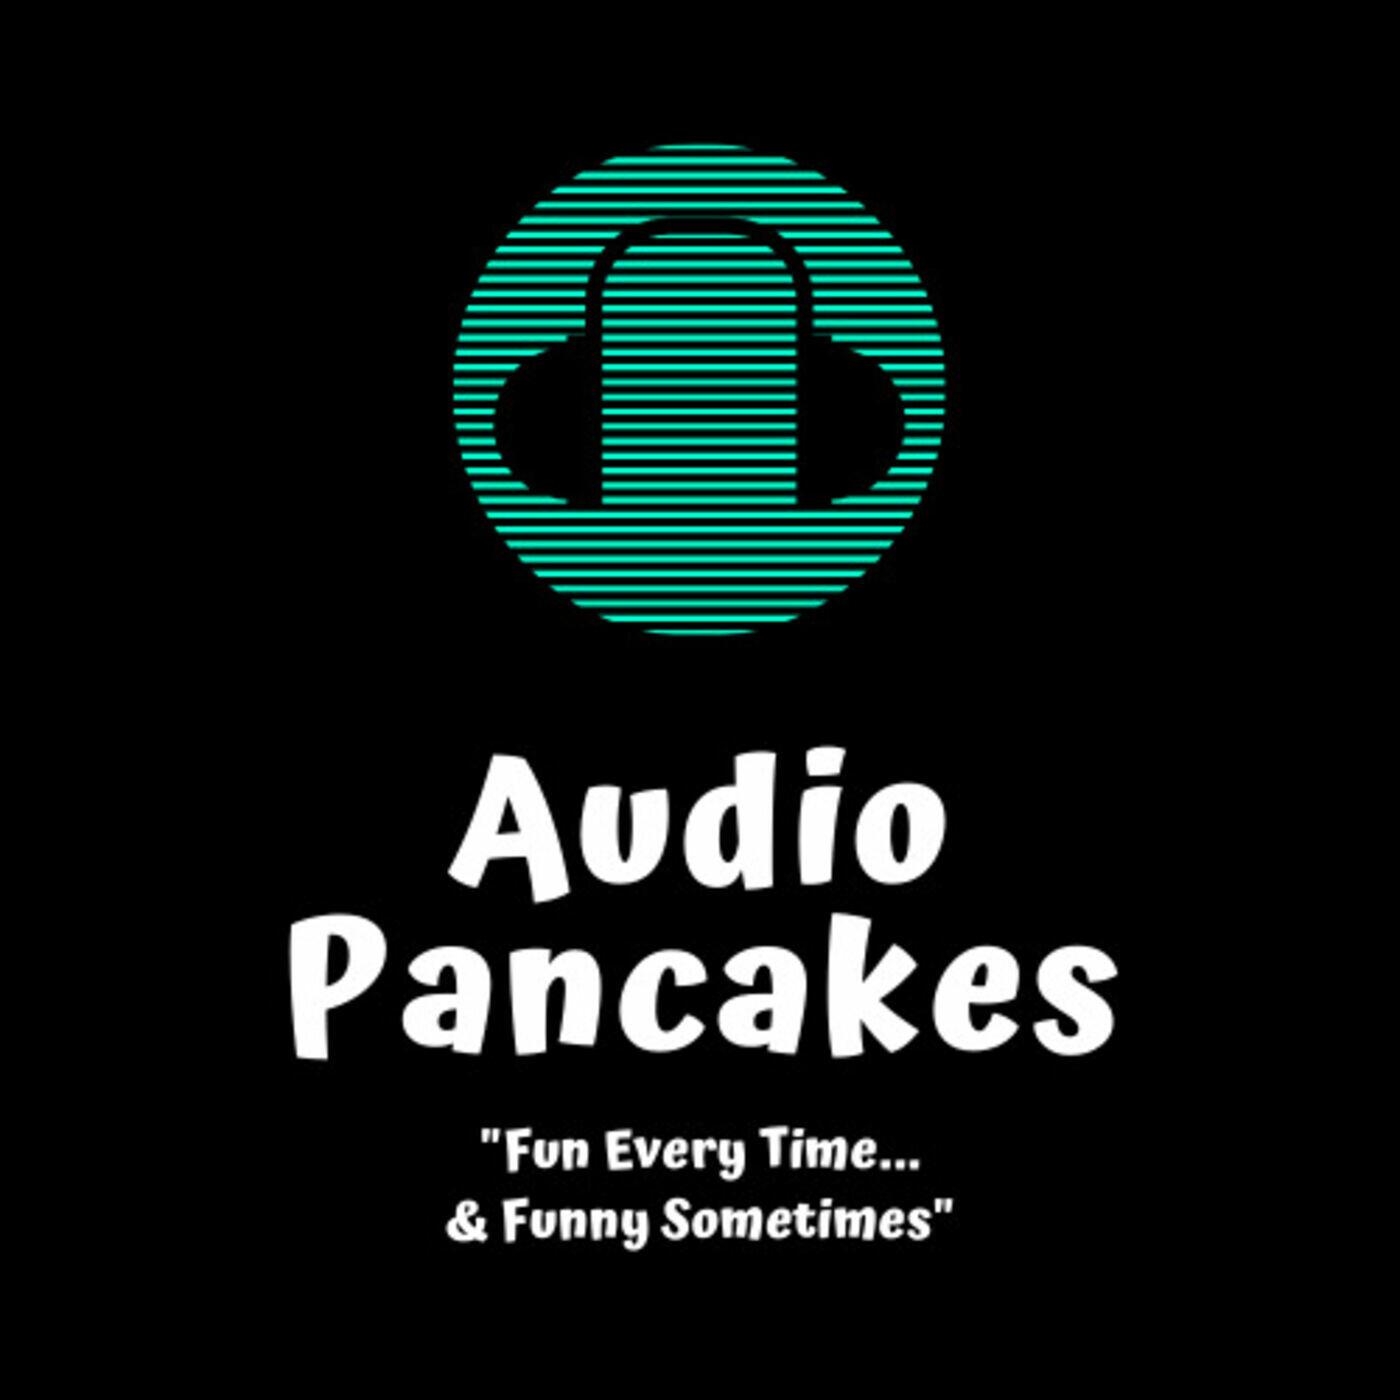 Audio Pancakes